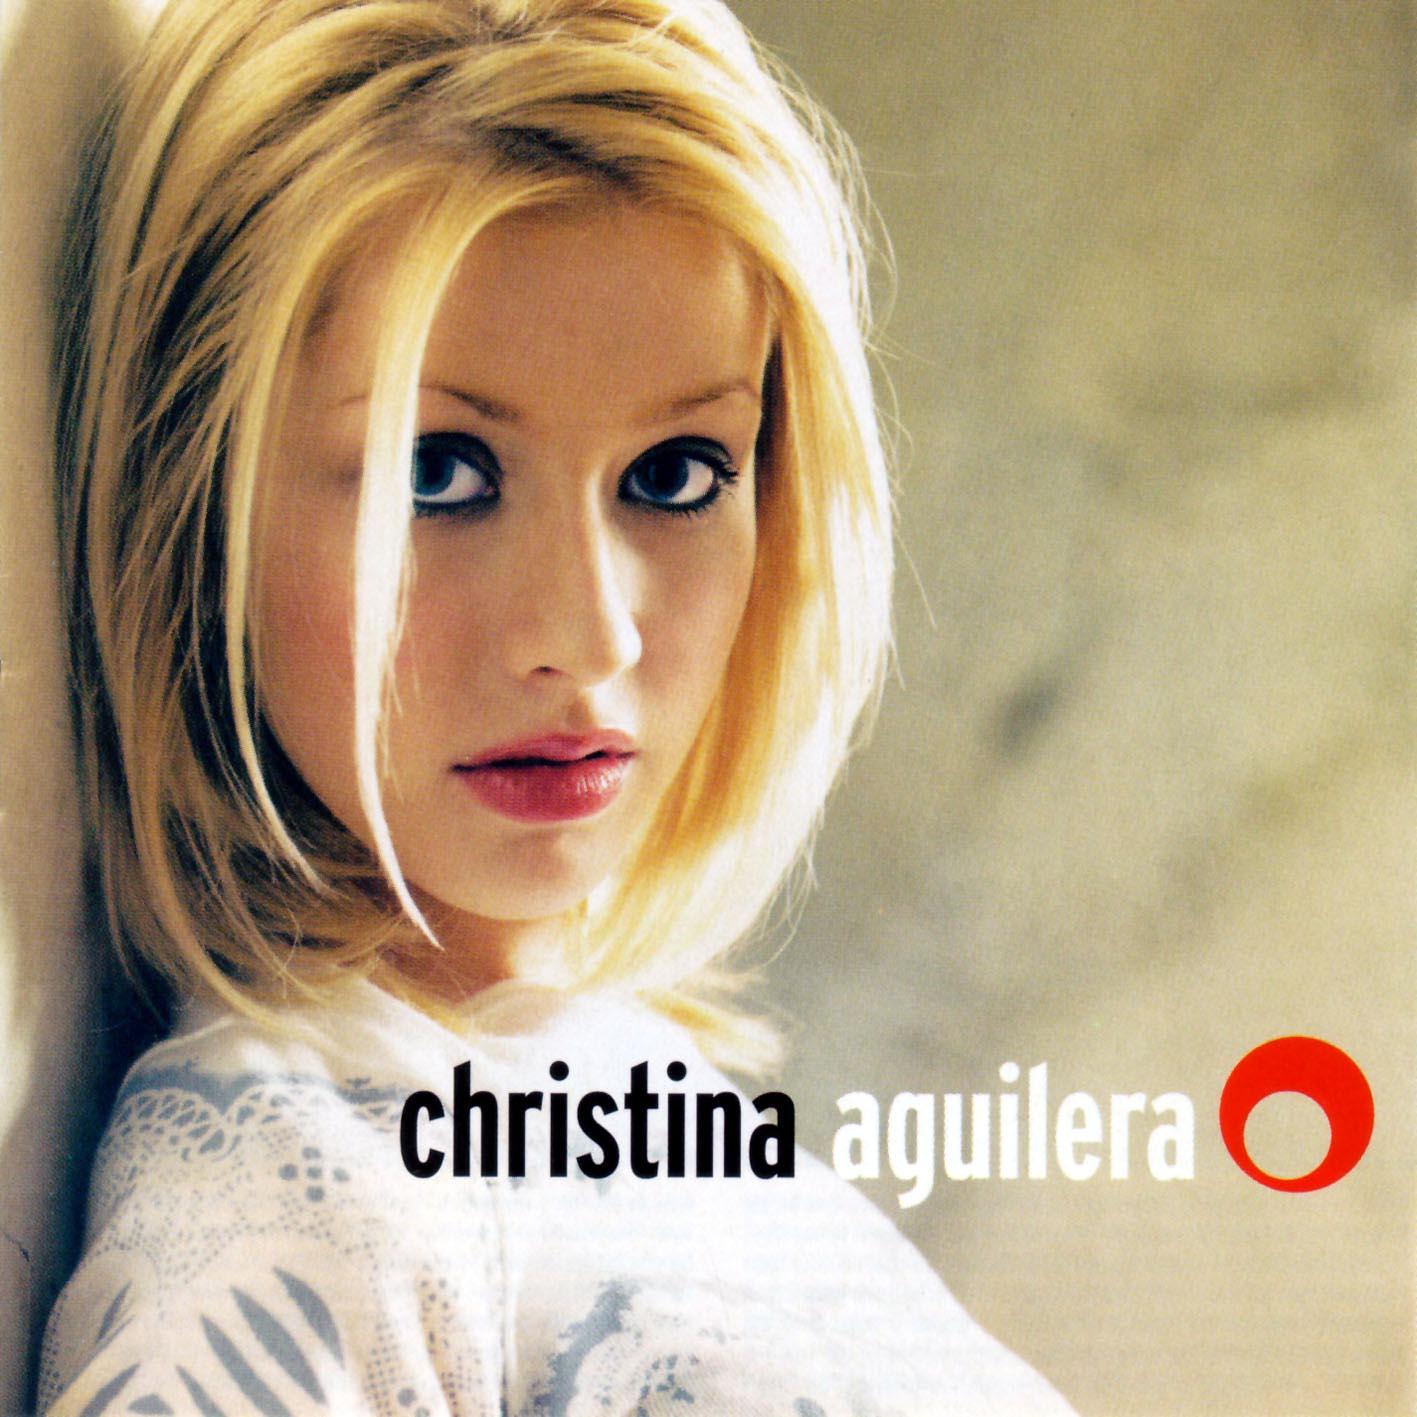 http://4.bp.blogspot.com/_V0x6h0Yuces/S7qgMLOnFgI/AAAAAAAAALM/hbmJDMvRL_g/s1600/christina_aguilera_-_christina_aguilera-front.jpg